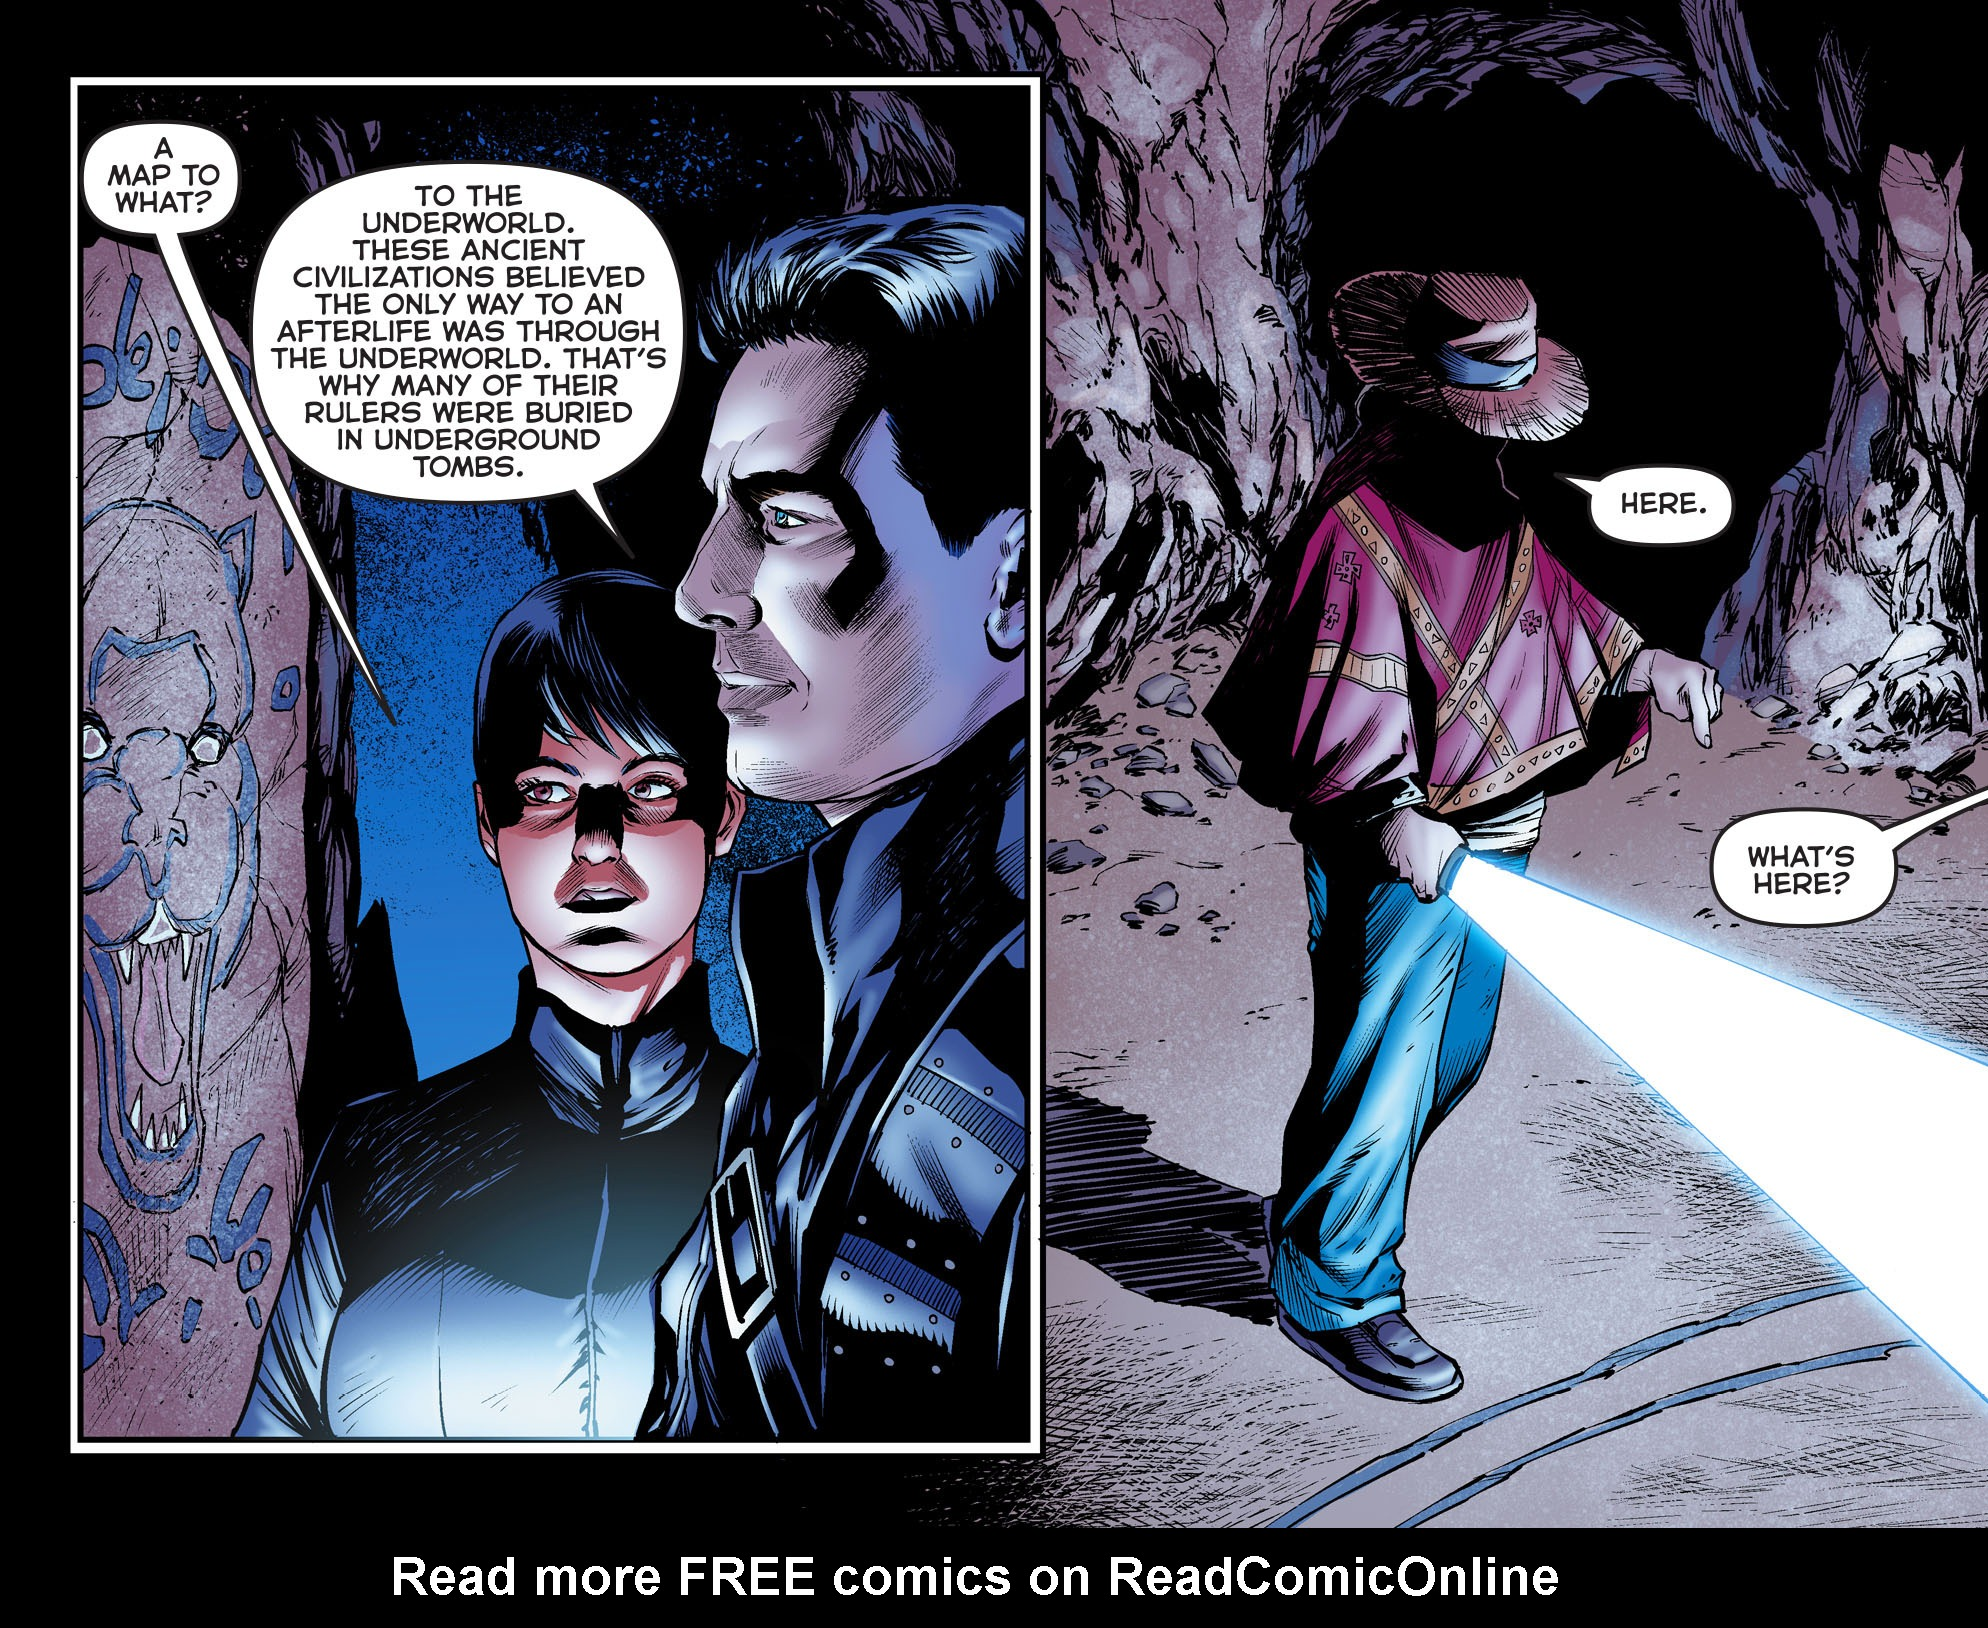 Read online Arrow: The Dark Archer comic -  Issue #3 - 11